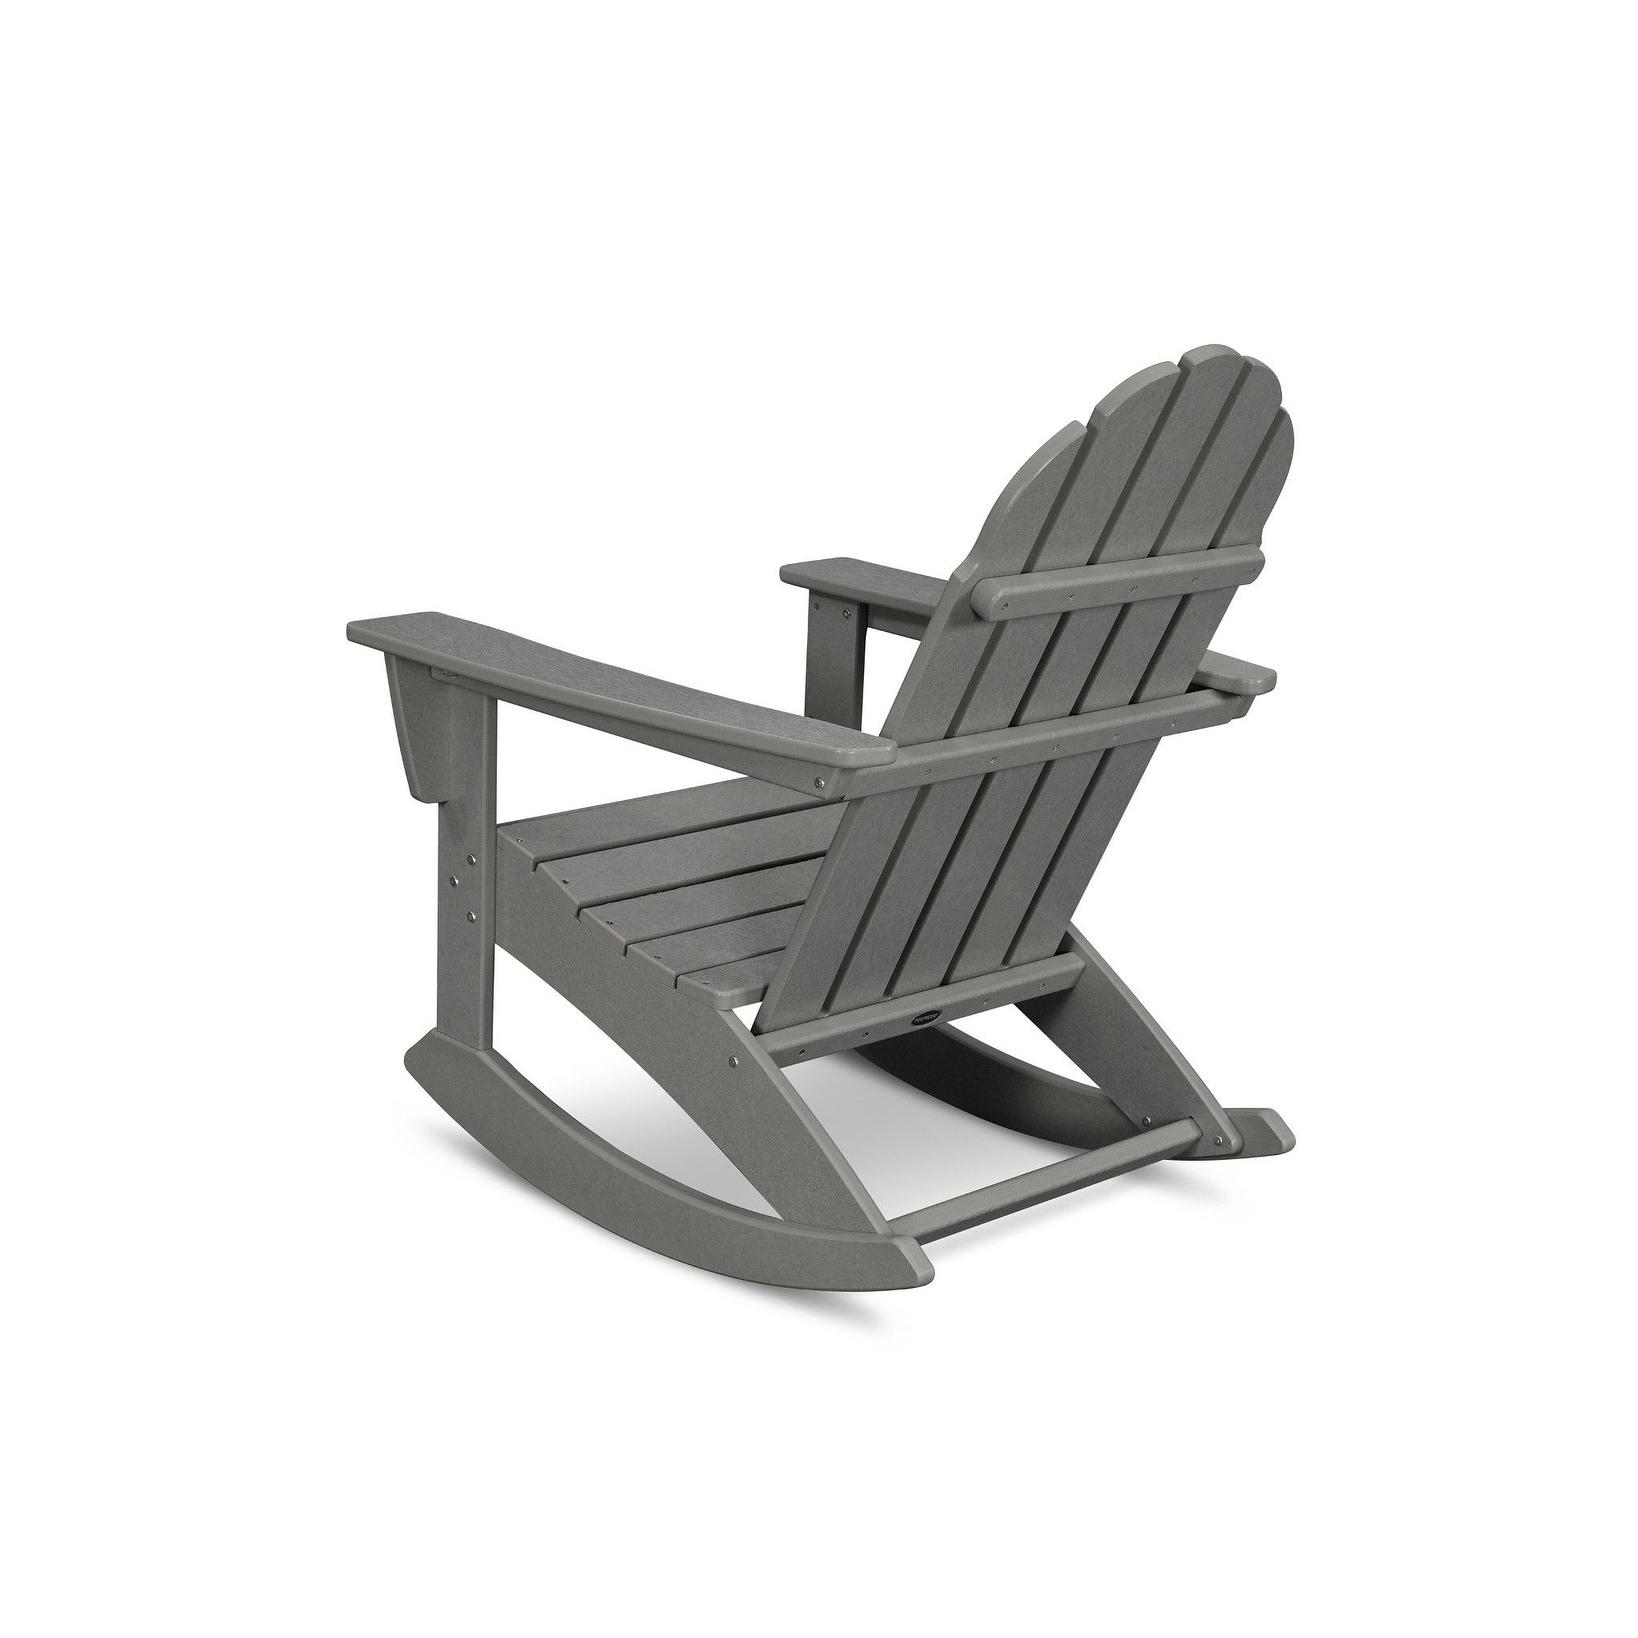 Shop Polywood Vineyard Outdoor Adirondack Rocking Chair Free